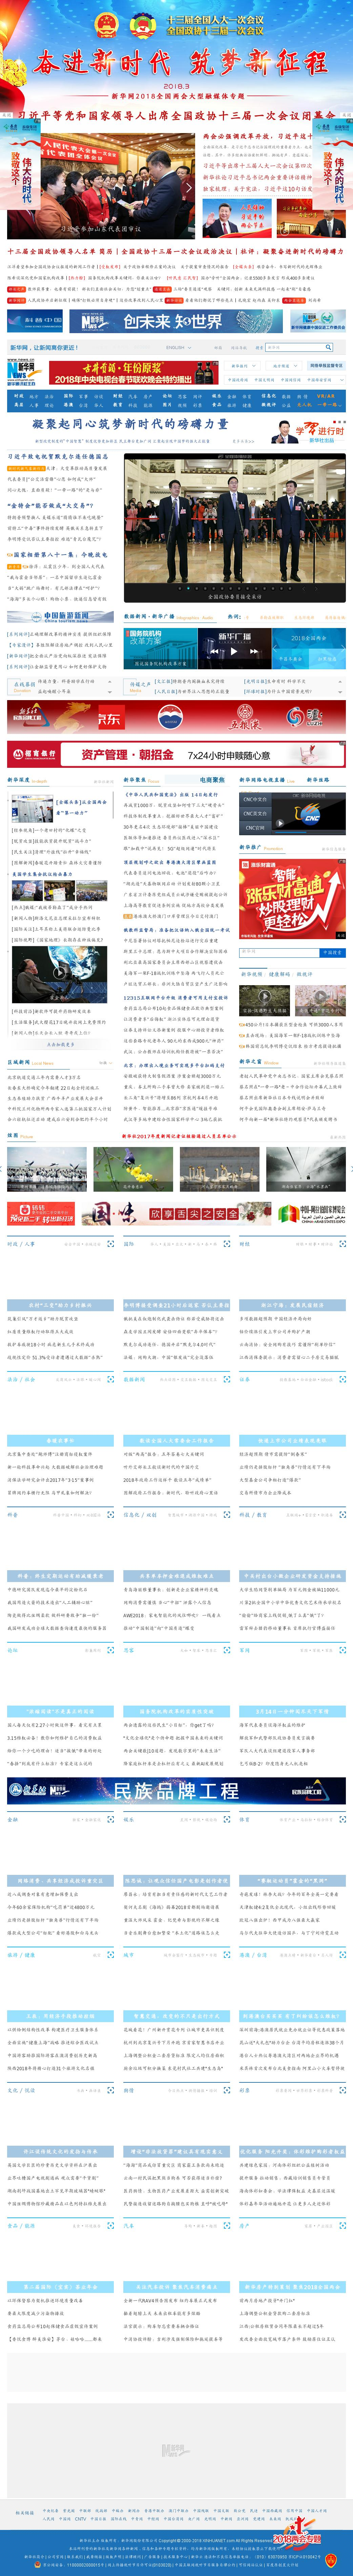 Xinhua at Thursday March 15, 2018, 1:22 p.m. UTC